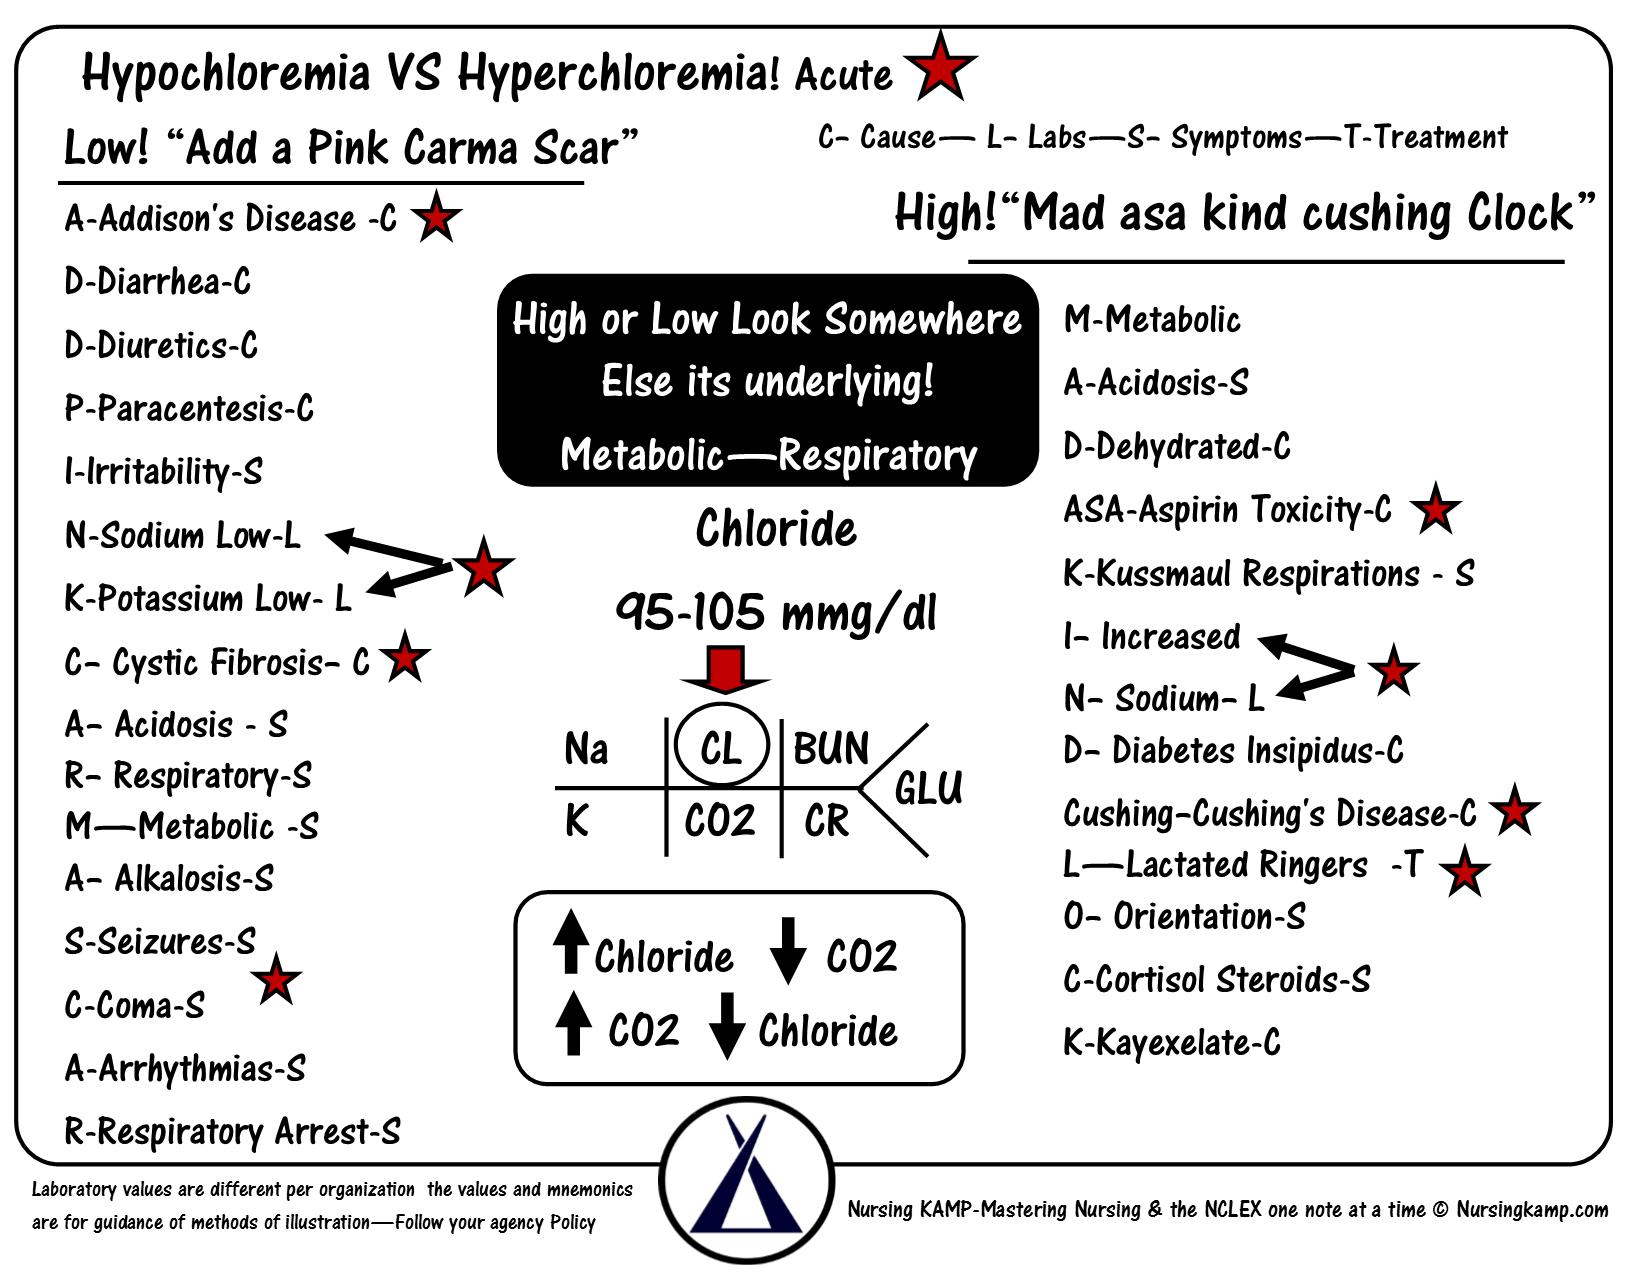 Chloride Co2 Bicarb Potassium Hyperkalemia Hypokalemia Hyponatremia Sodium Lab Value Blood